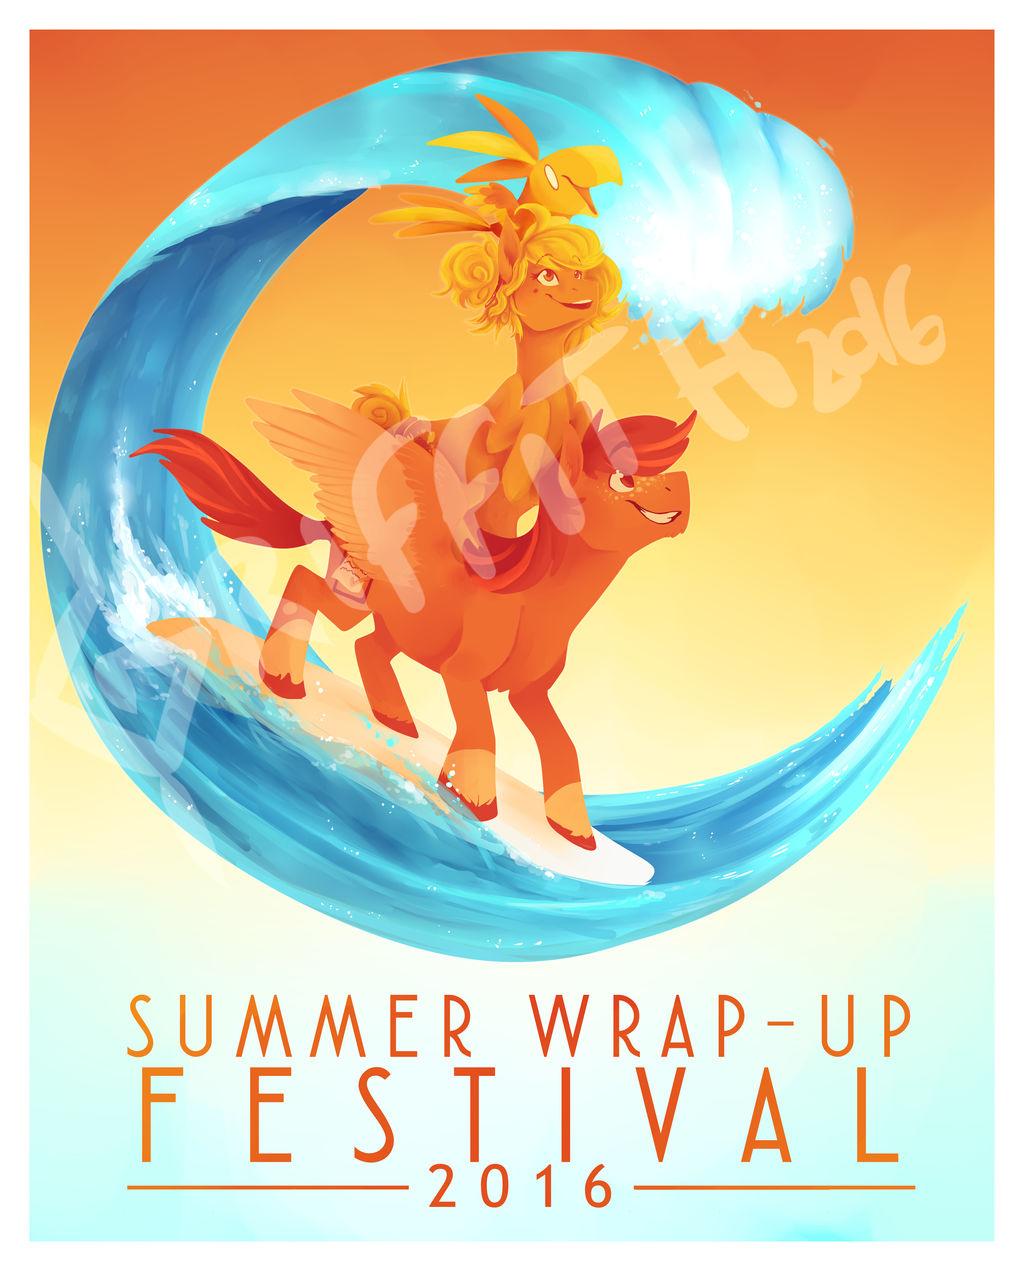 SUMMER WRAP-UP FESTIVAL 2016 - Promo Poster